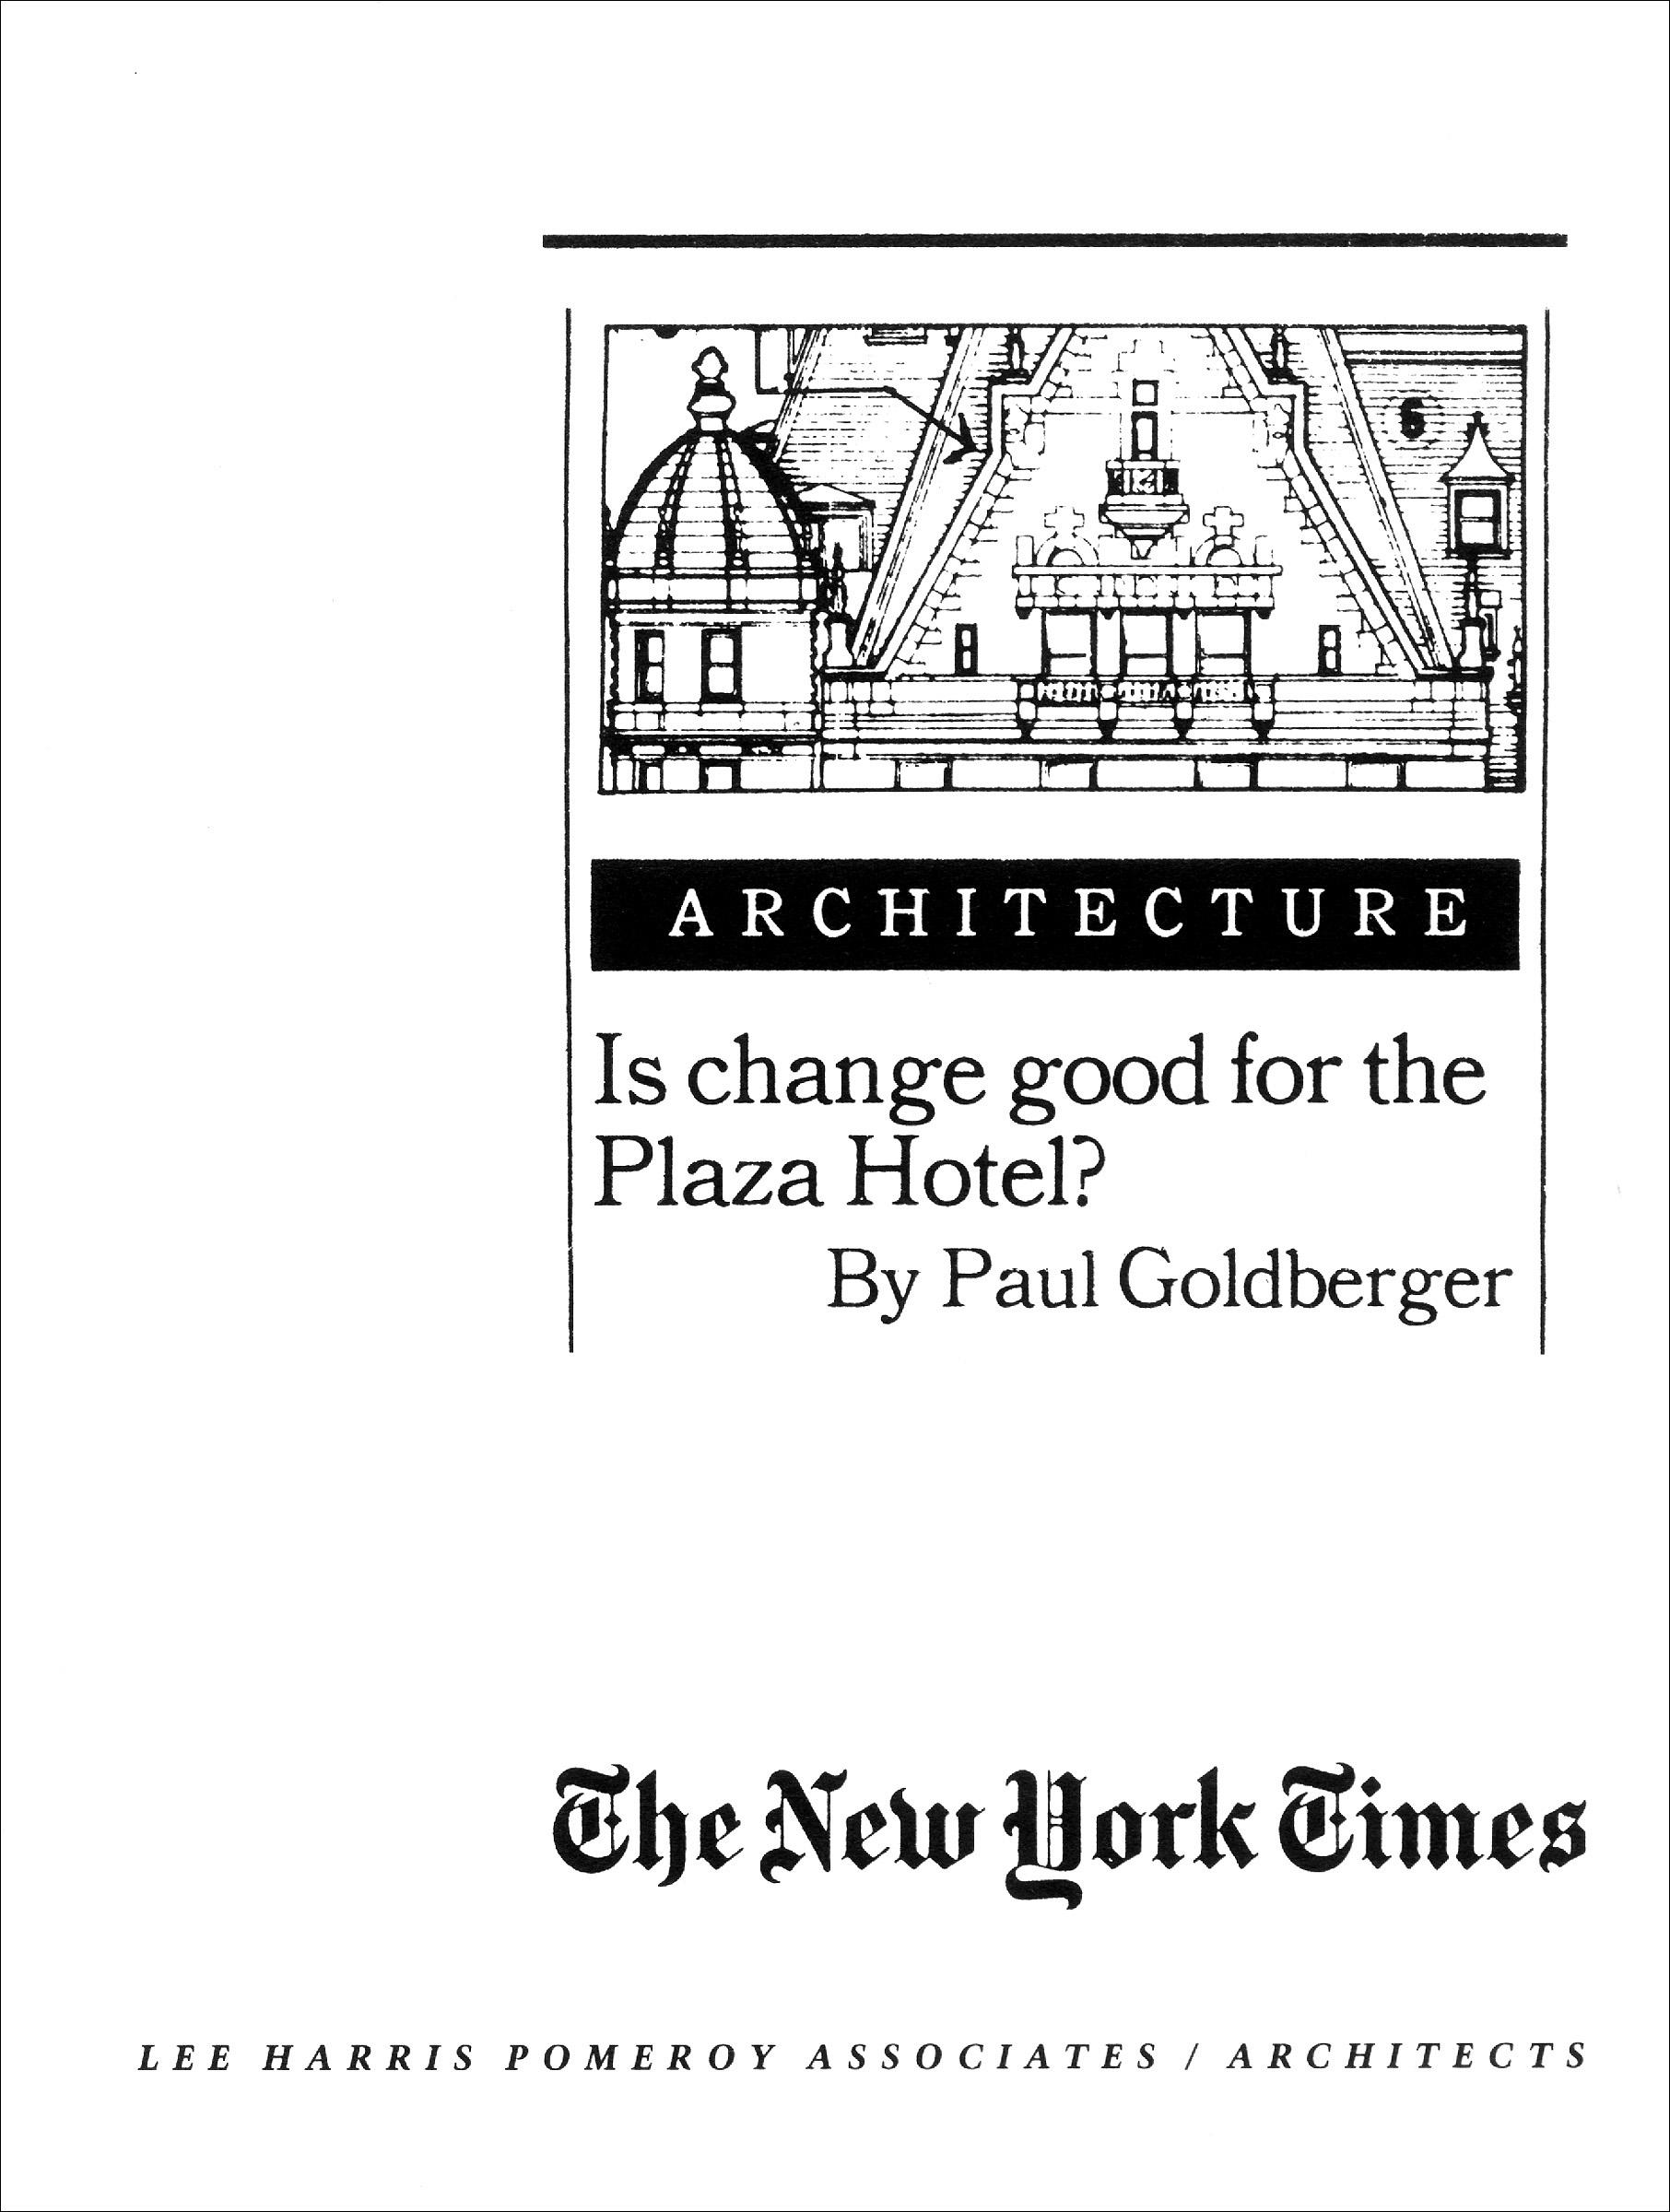 Plaza Hotel NY Times 2 Page 1.jpg